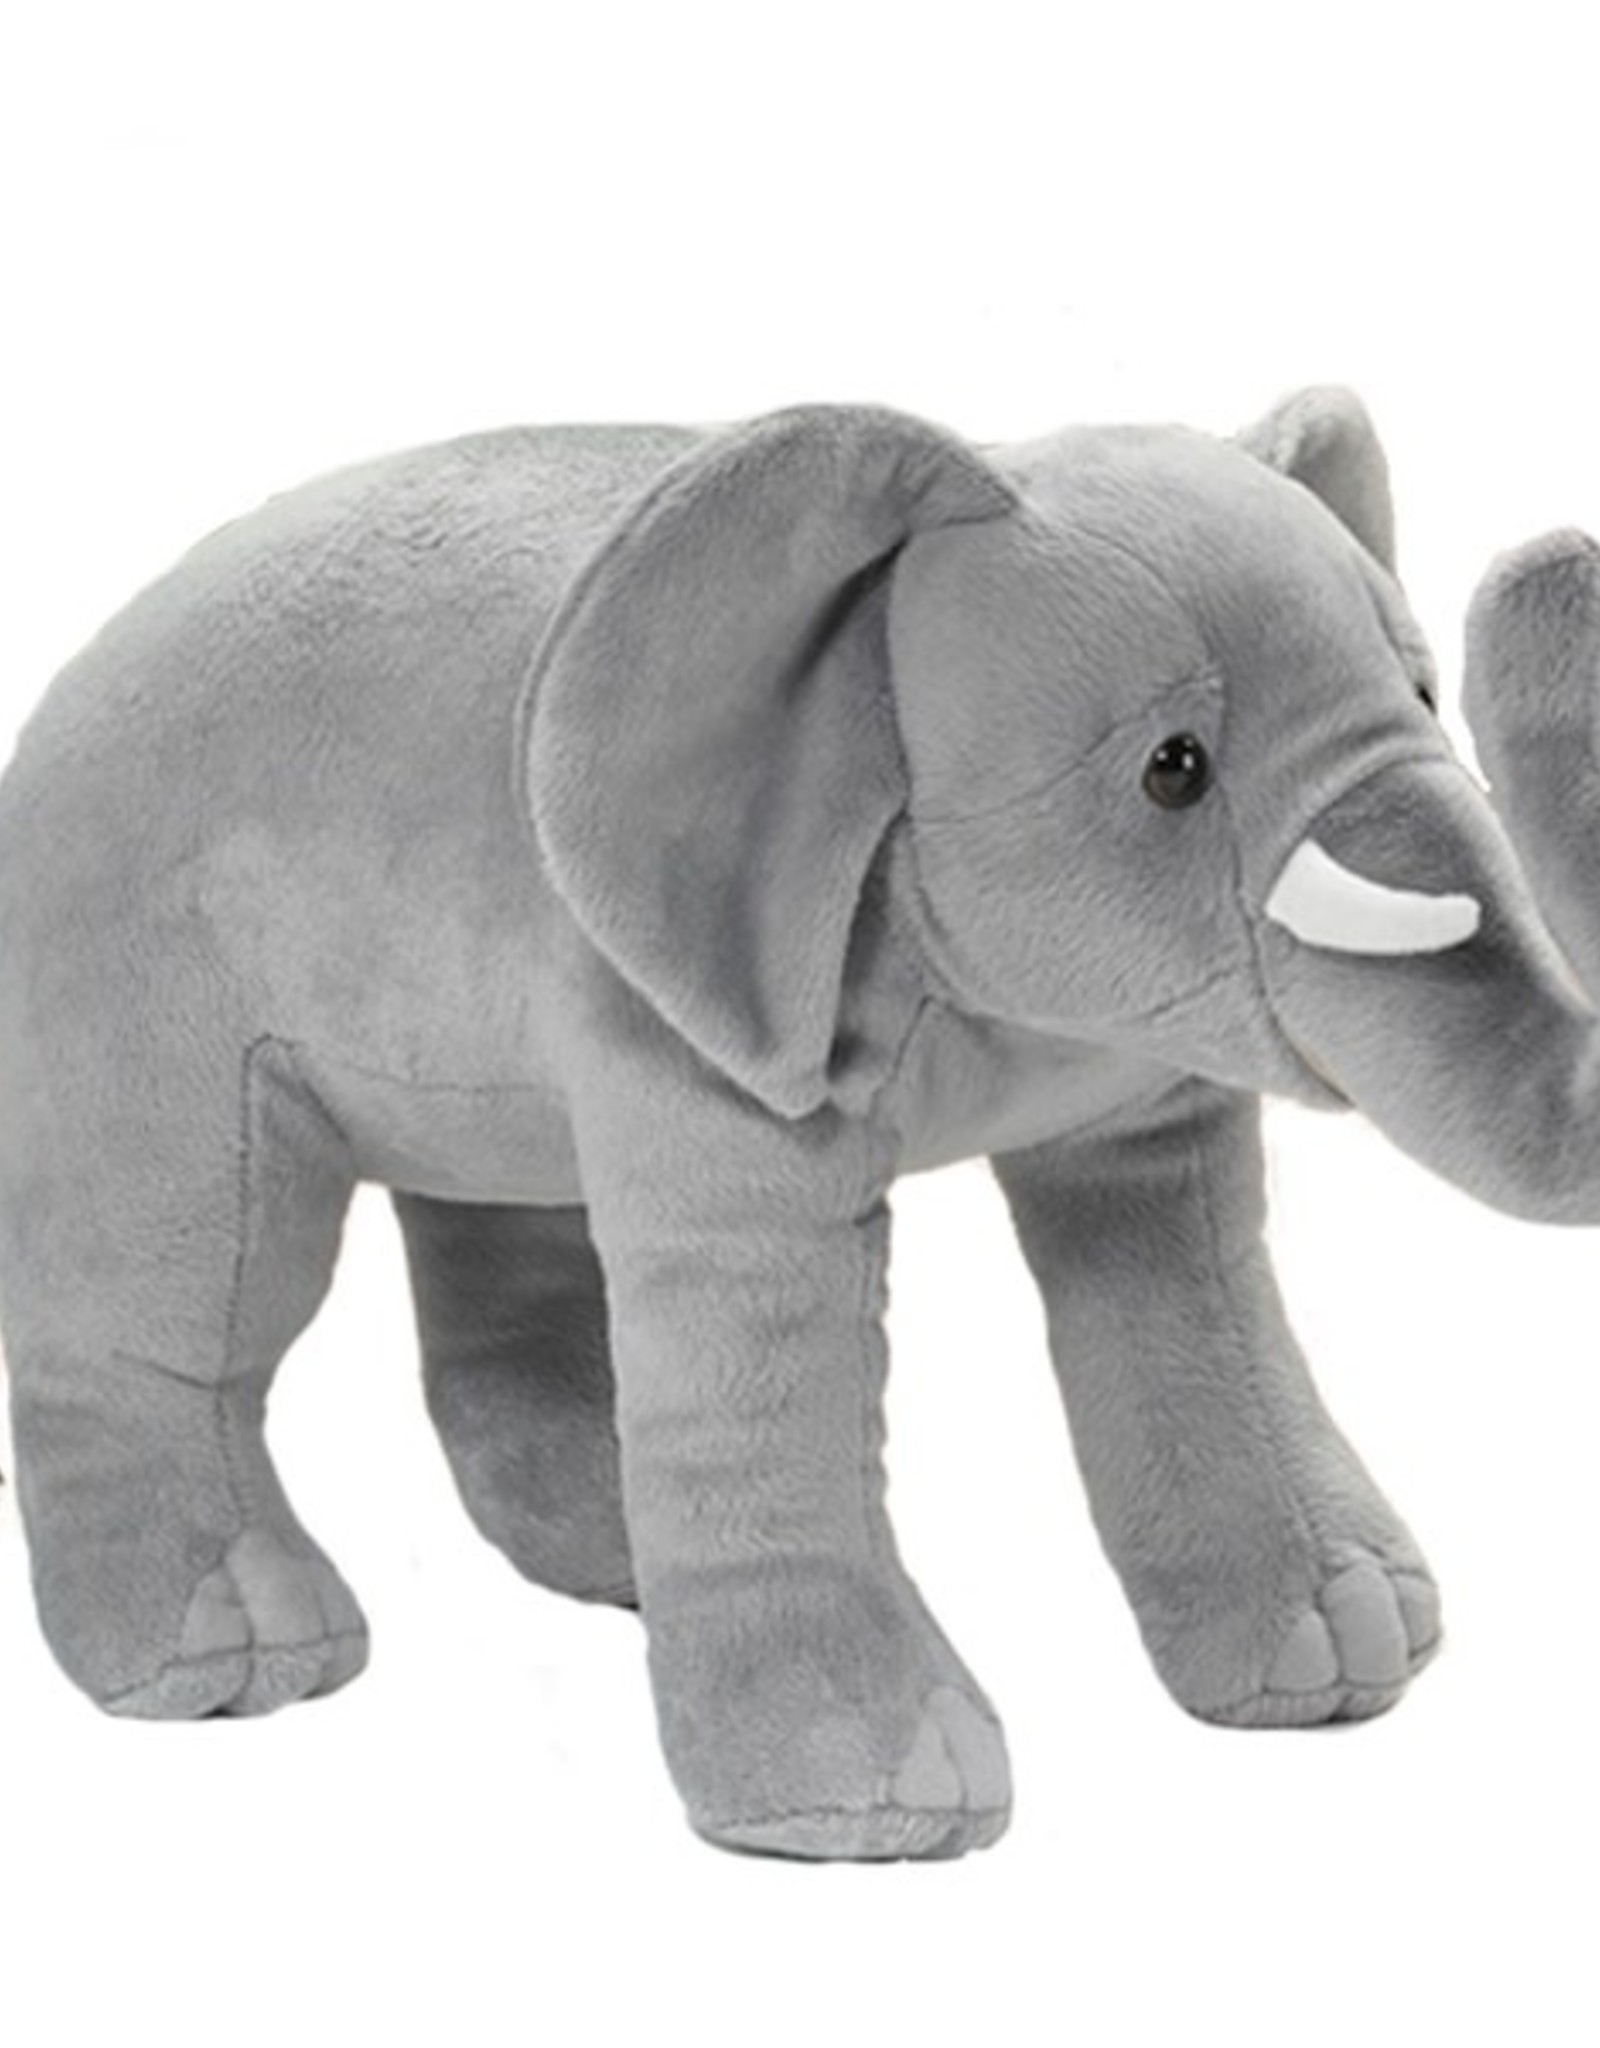 Conservation Critters Conservation Critters Elephant